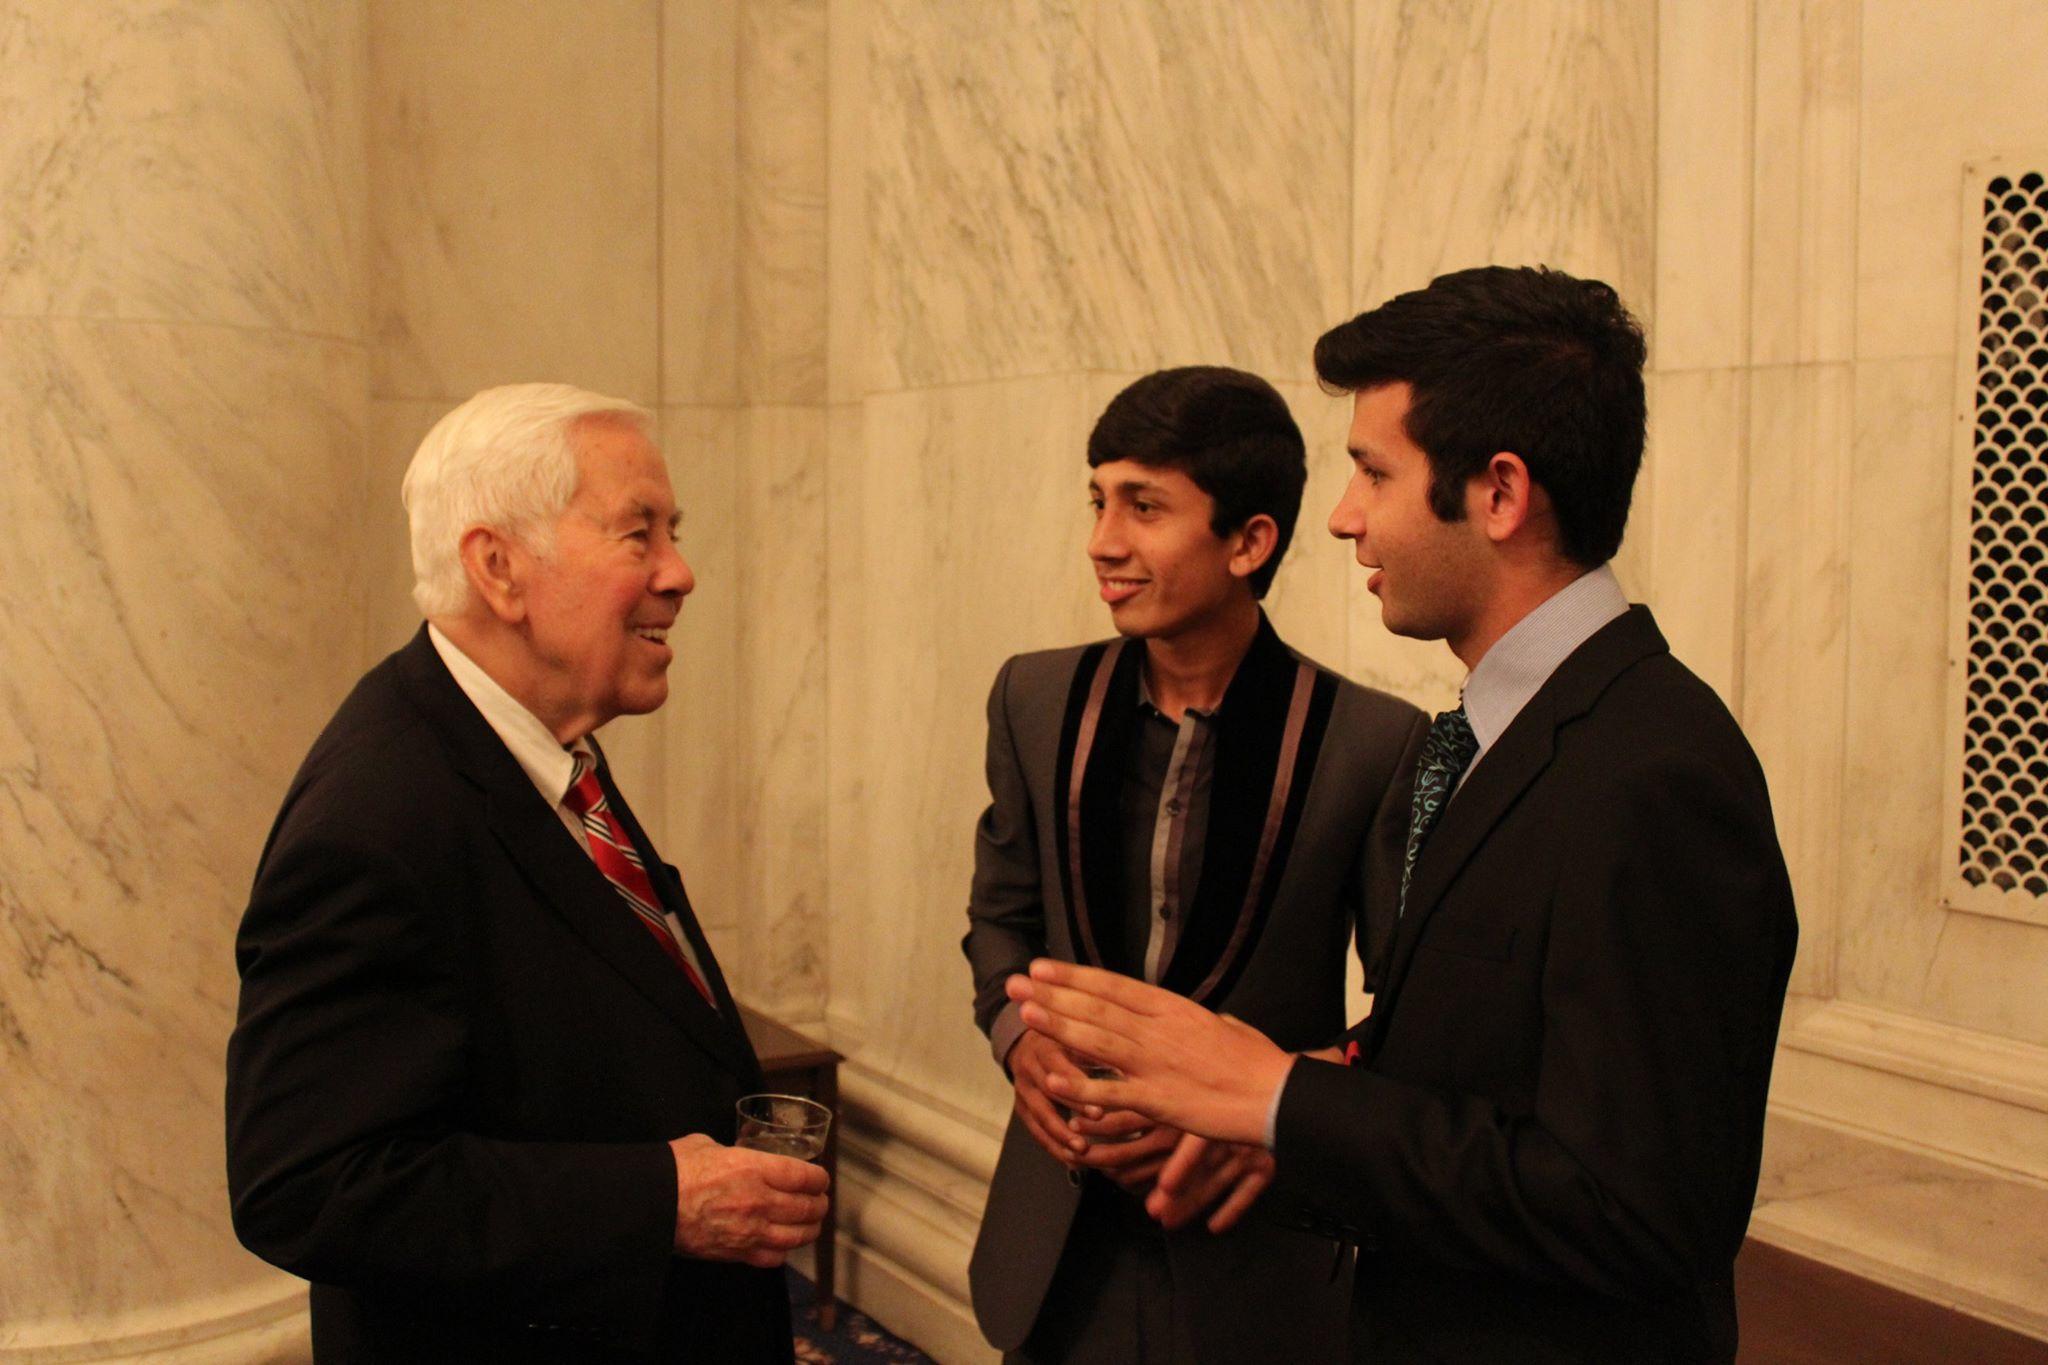 Senator Lugar meeting YES students in Washington, D.C.